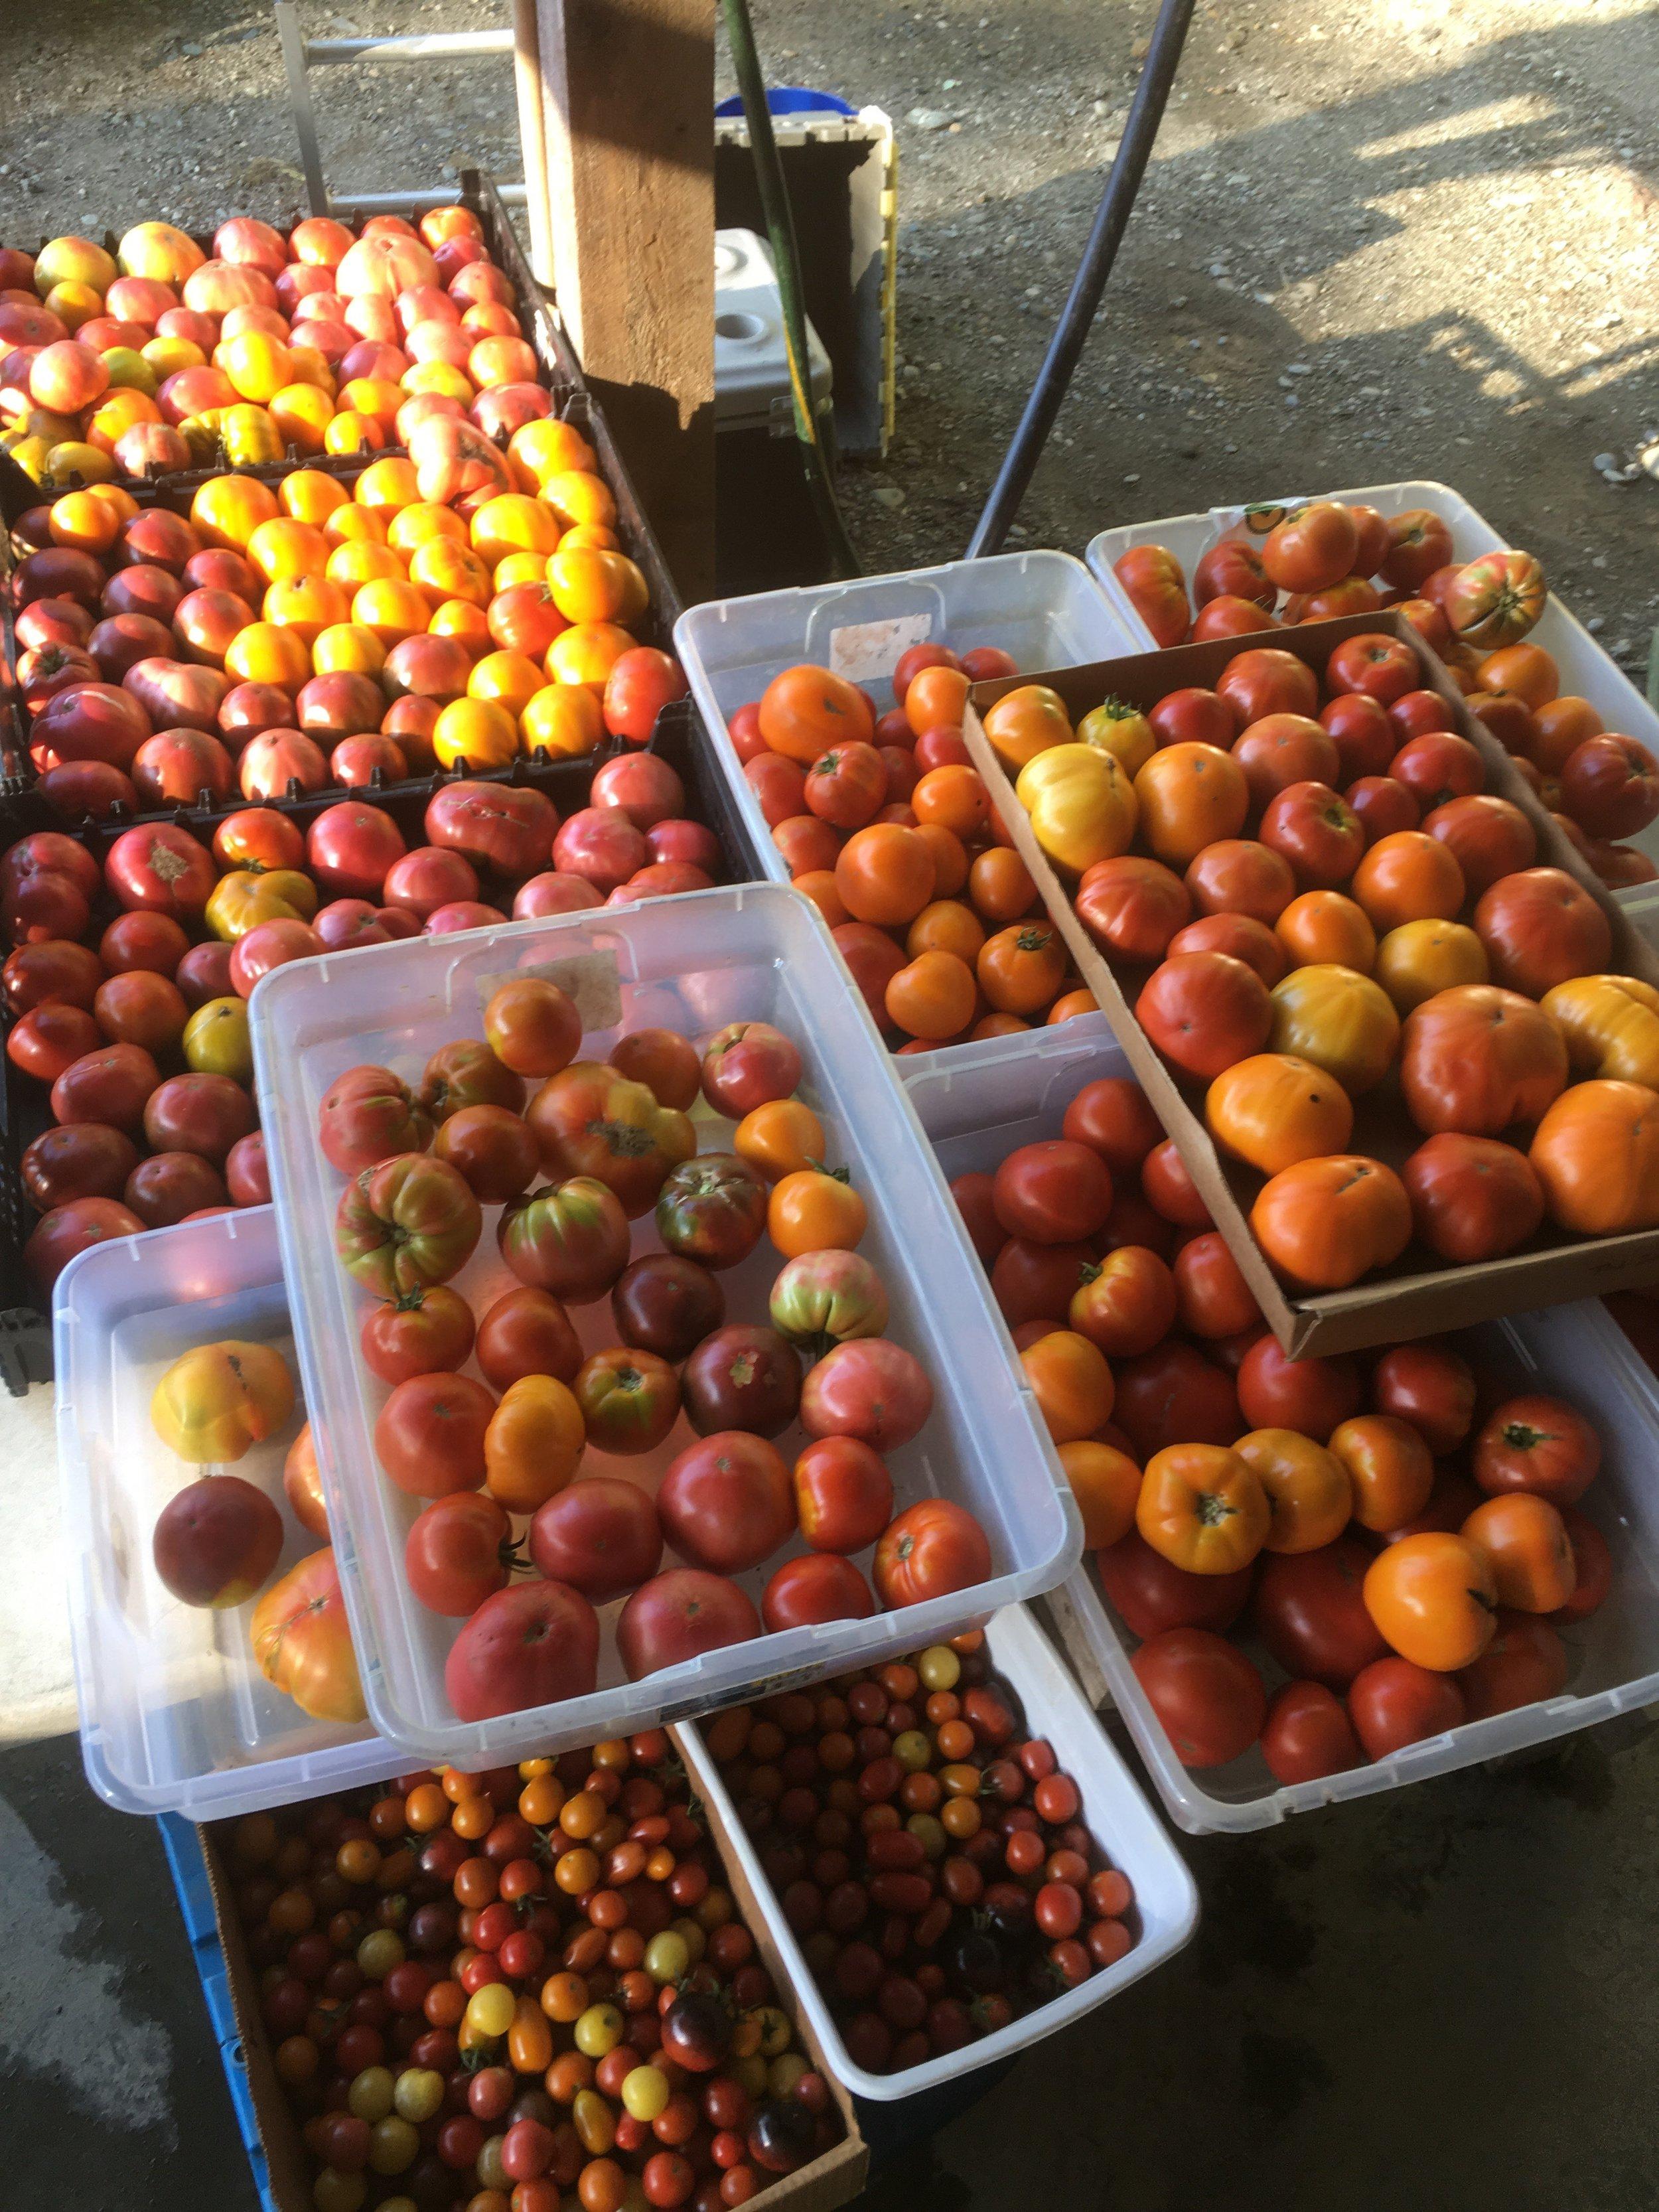 Tomatoes heading to restaurants last Friday